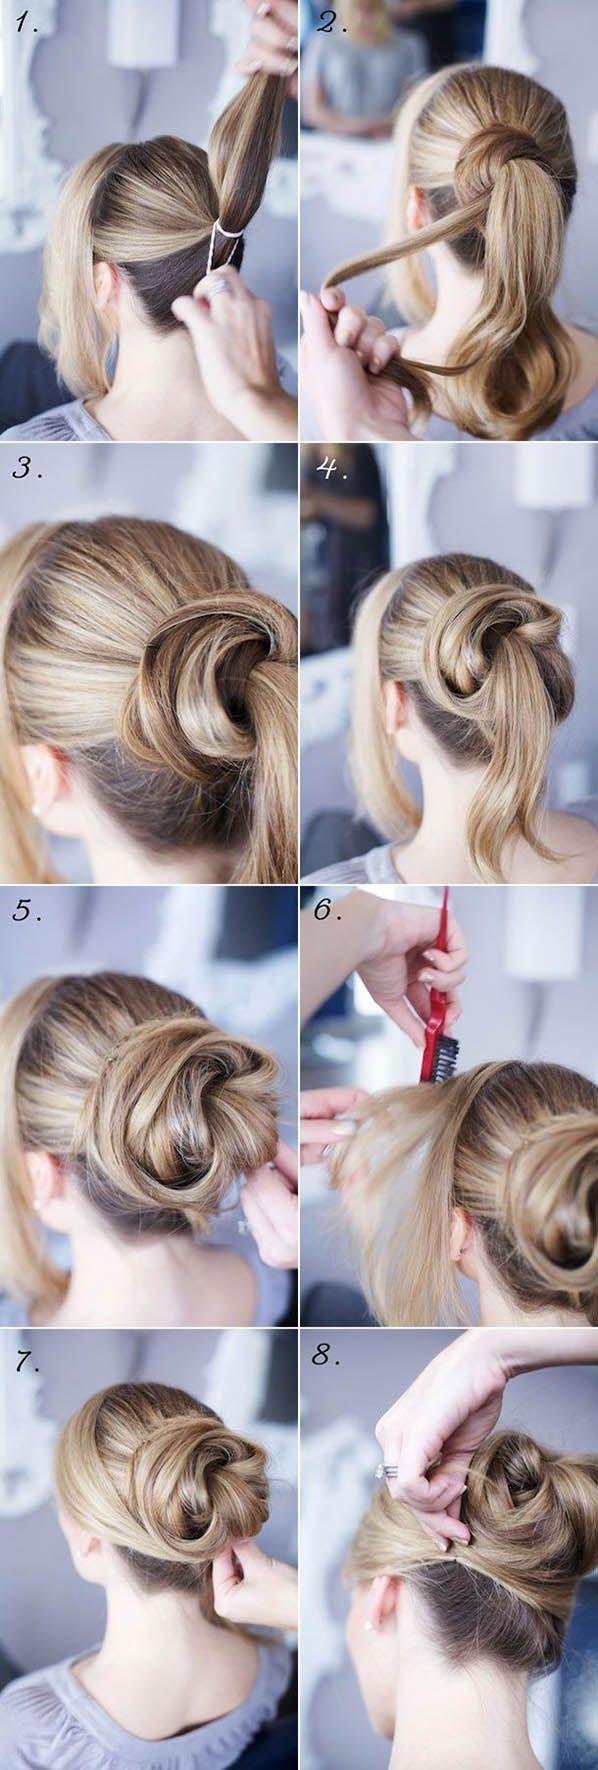 8 Step To DIY Hair Tutorials